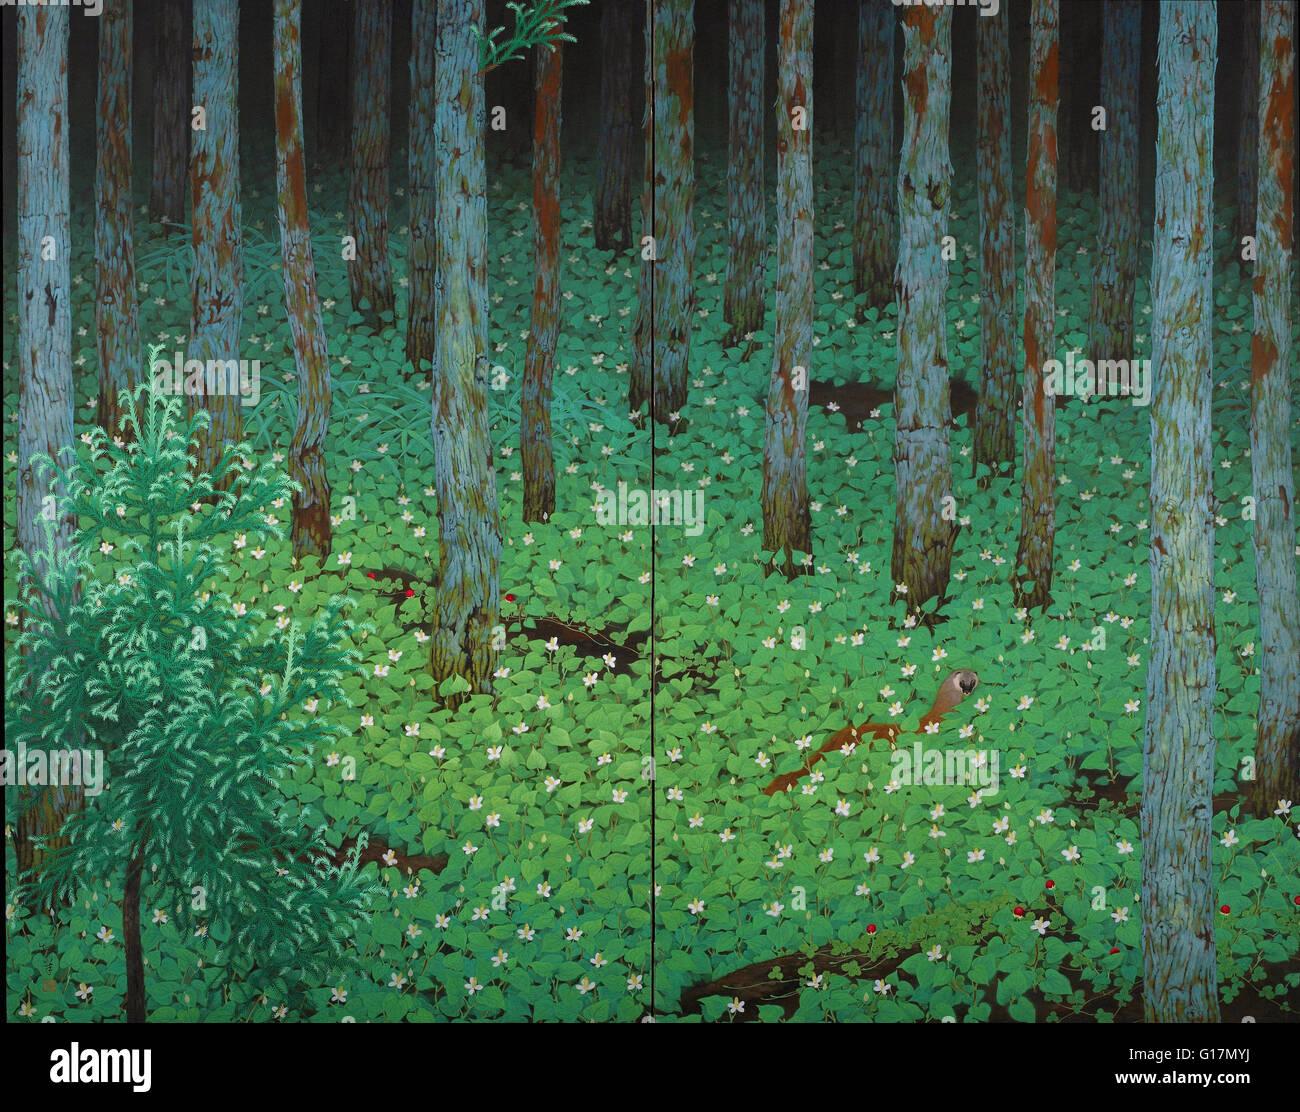 Katayama Bokuyo - Mori (Forest) - Minneapolis Institute of Art - Stock Image